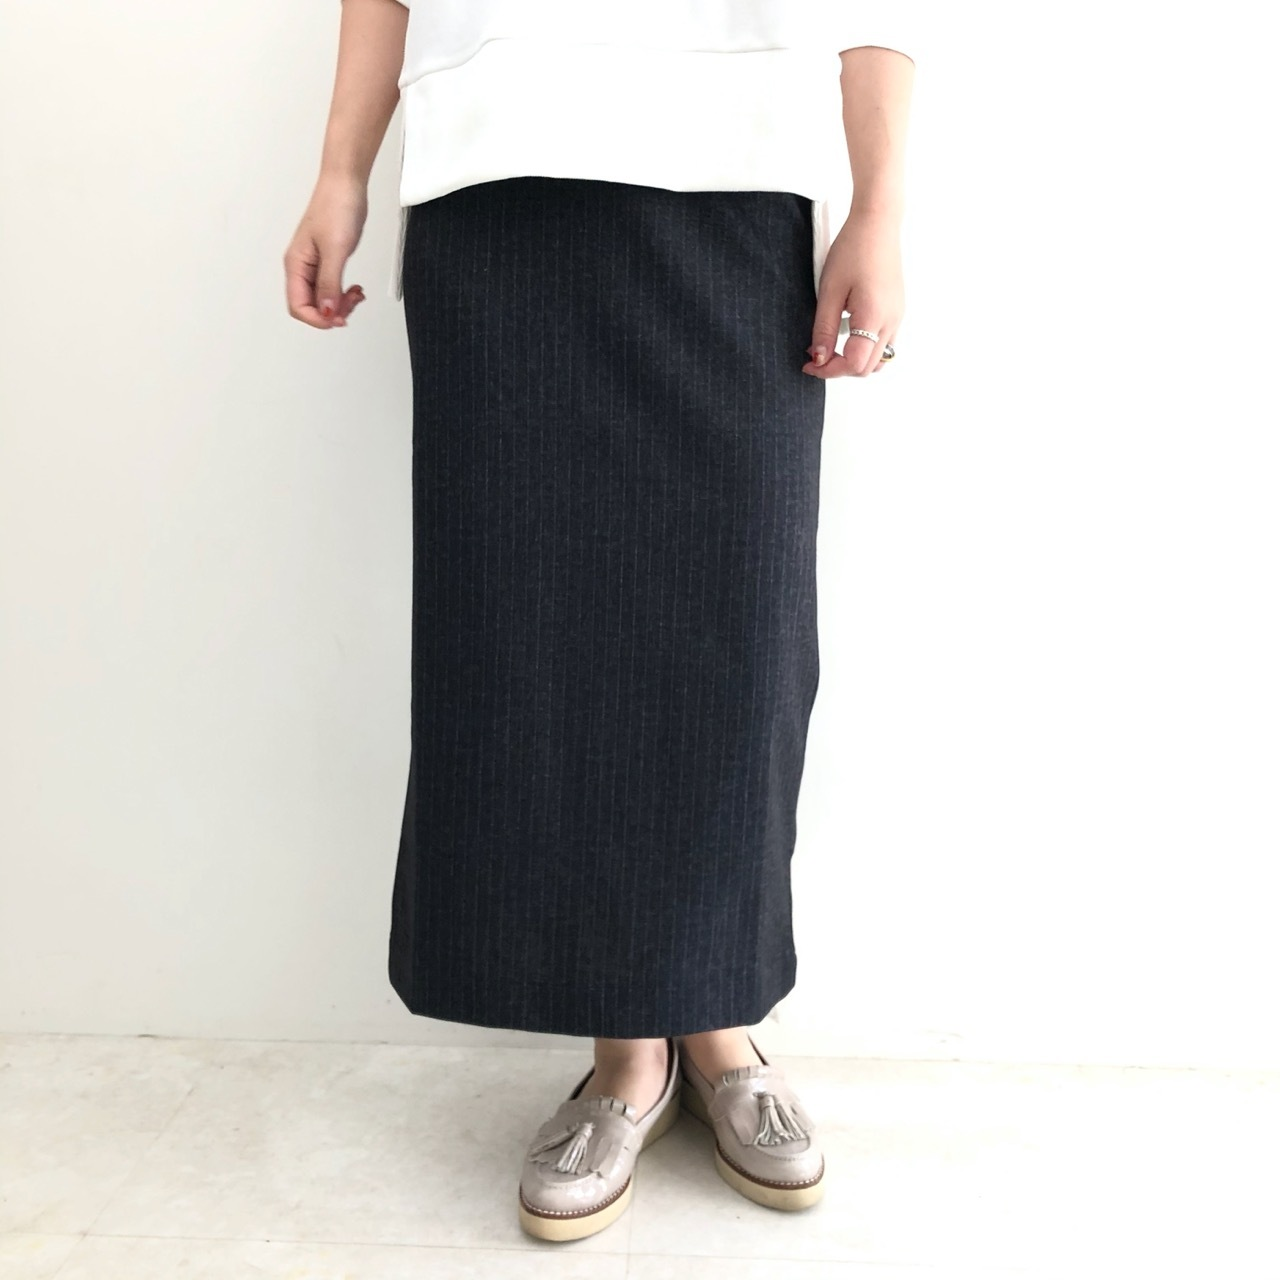 【 Praia 】- LER-19135 - ストライプスカート